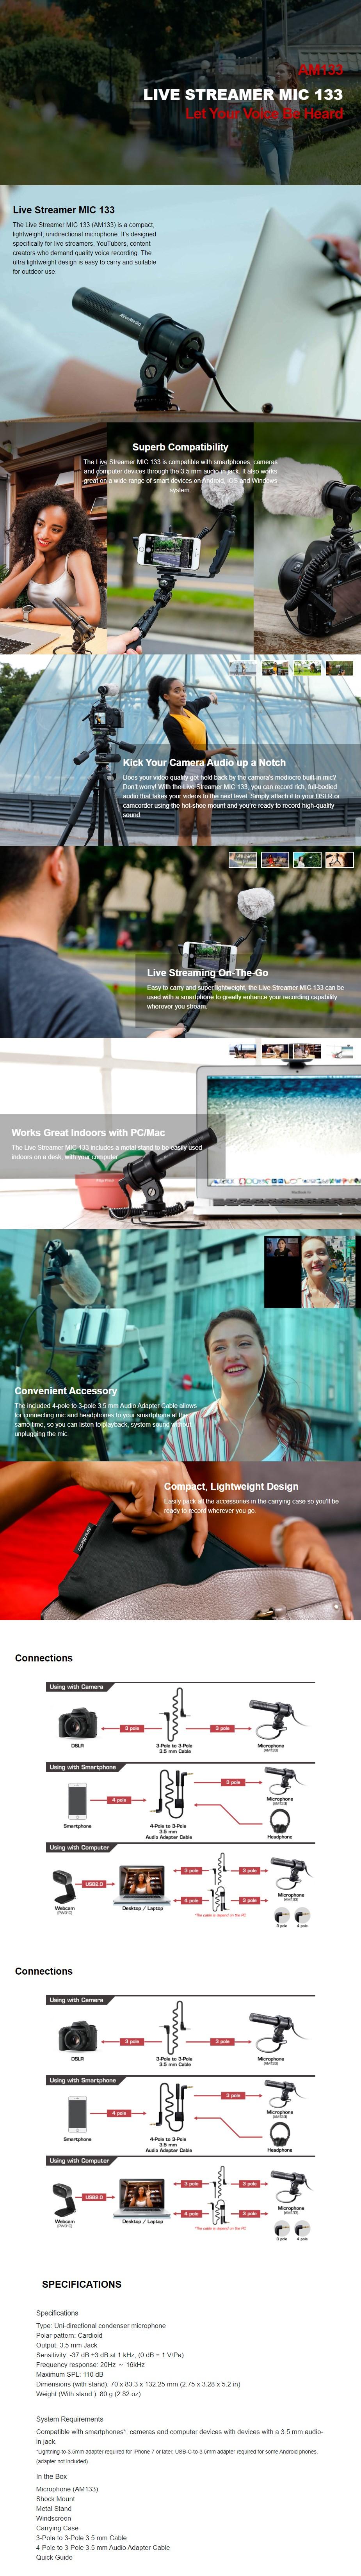 avermedia-live-streamer-mic-am133-compact-cardioid-microphone-ac32548-2.jpg